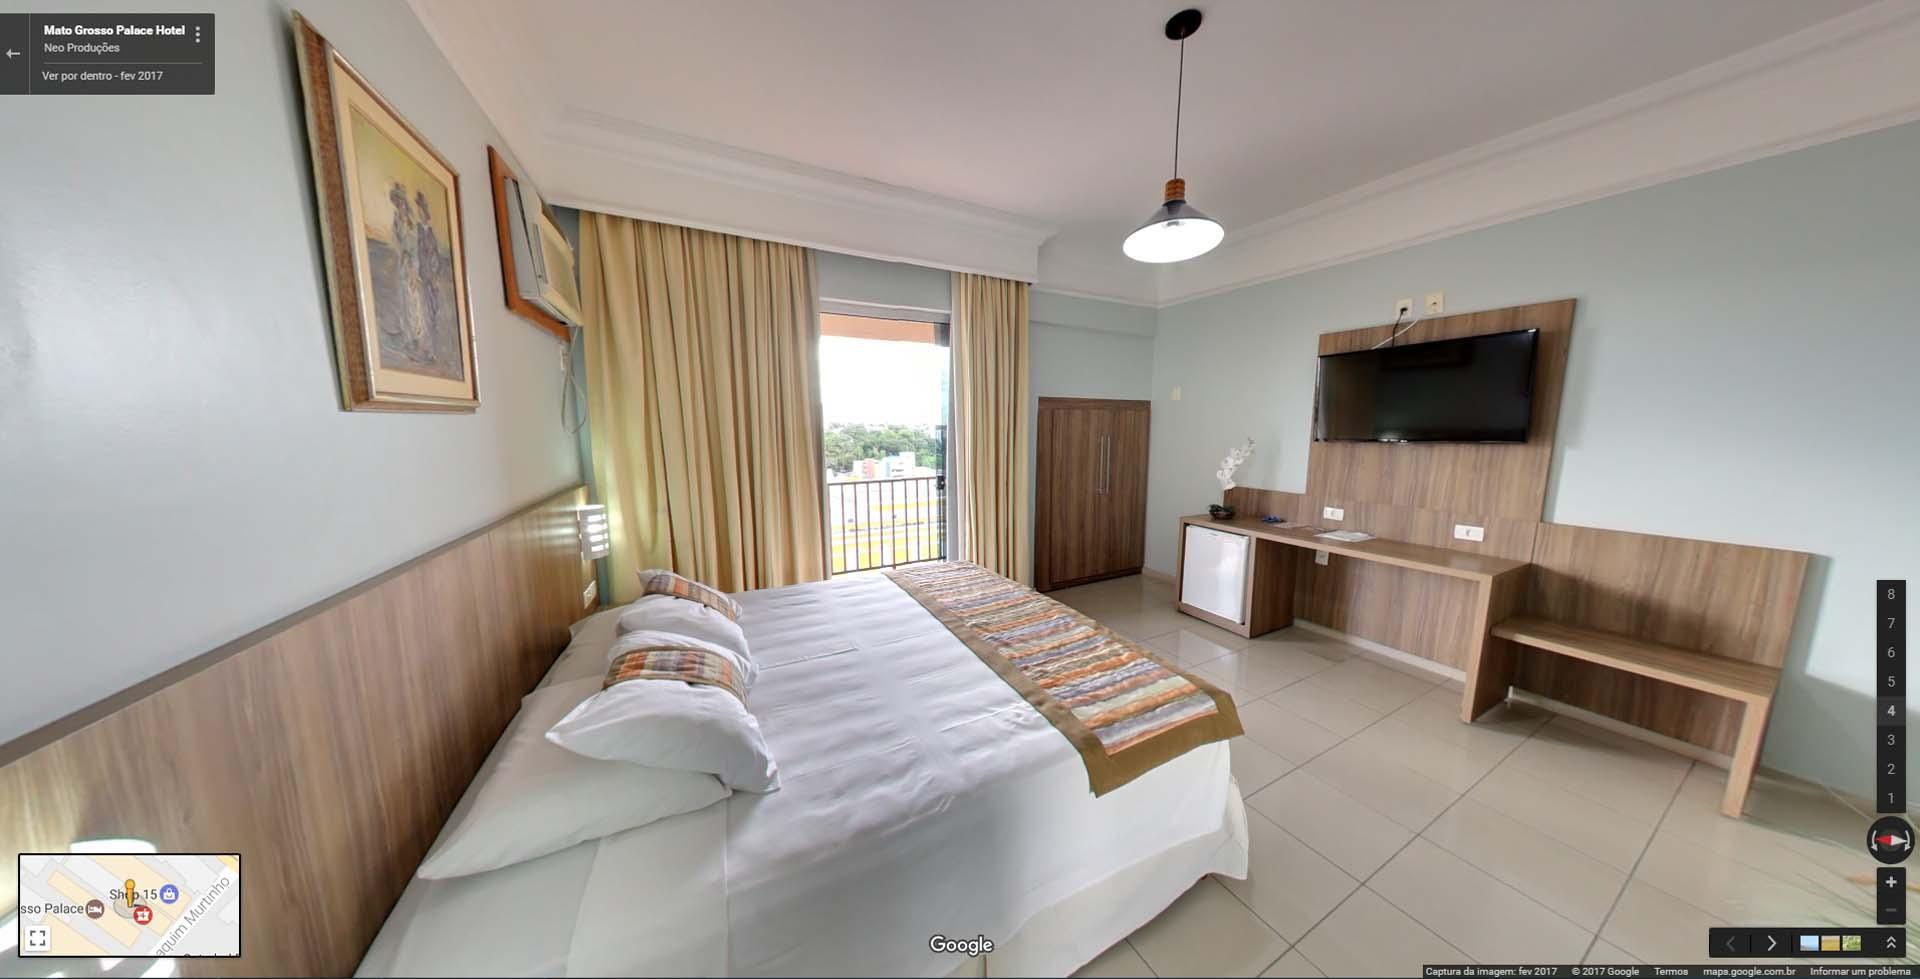 Mato Grosso Palace Hotel